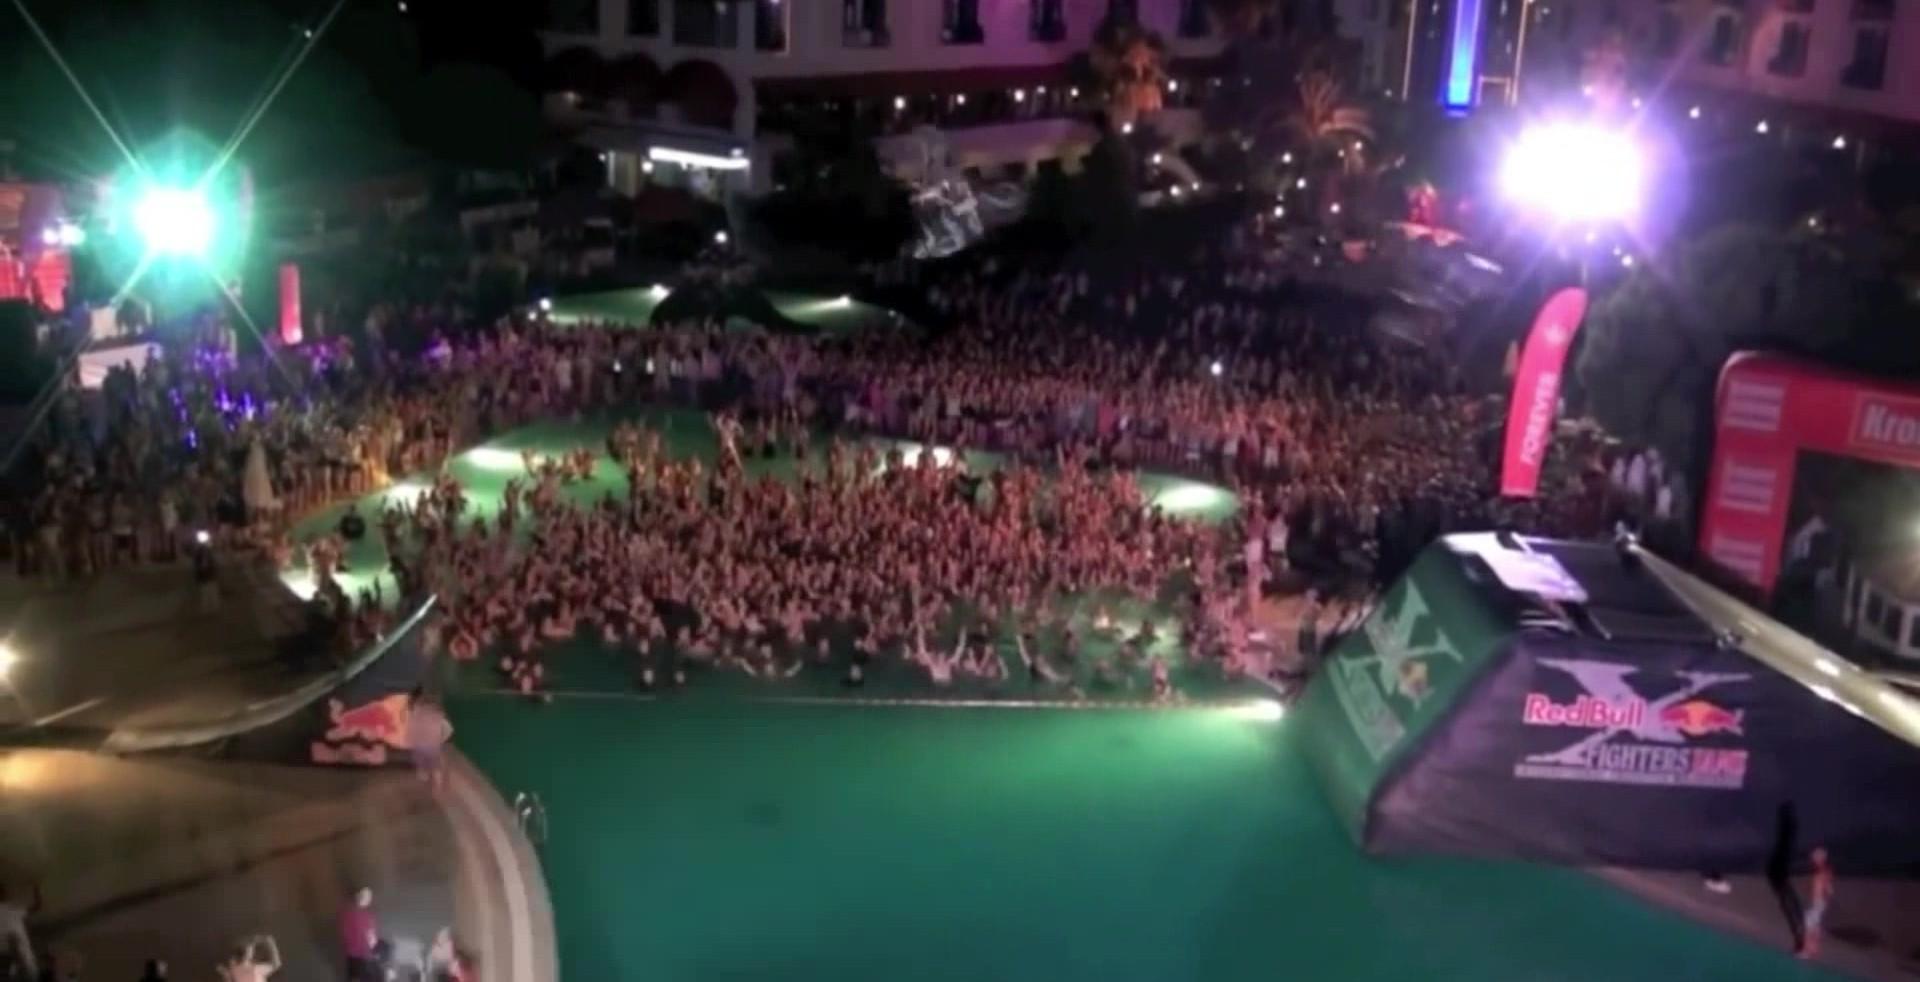 Festival Video DONE 2.0 1.mov